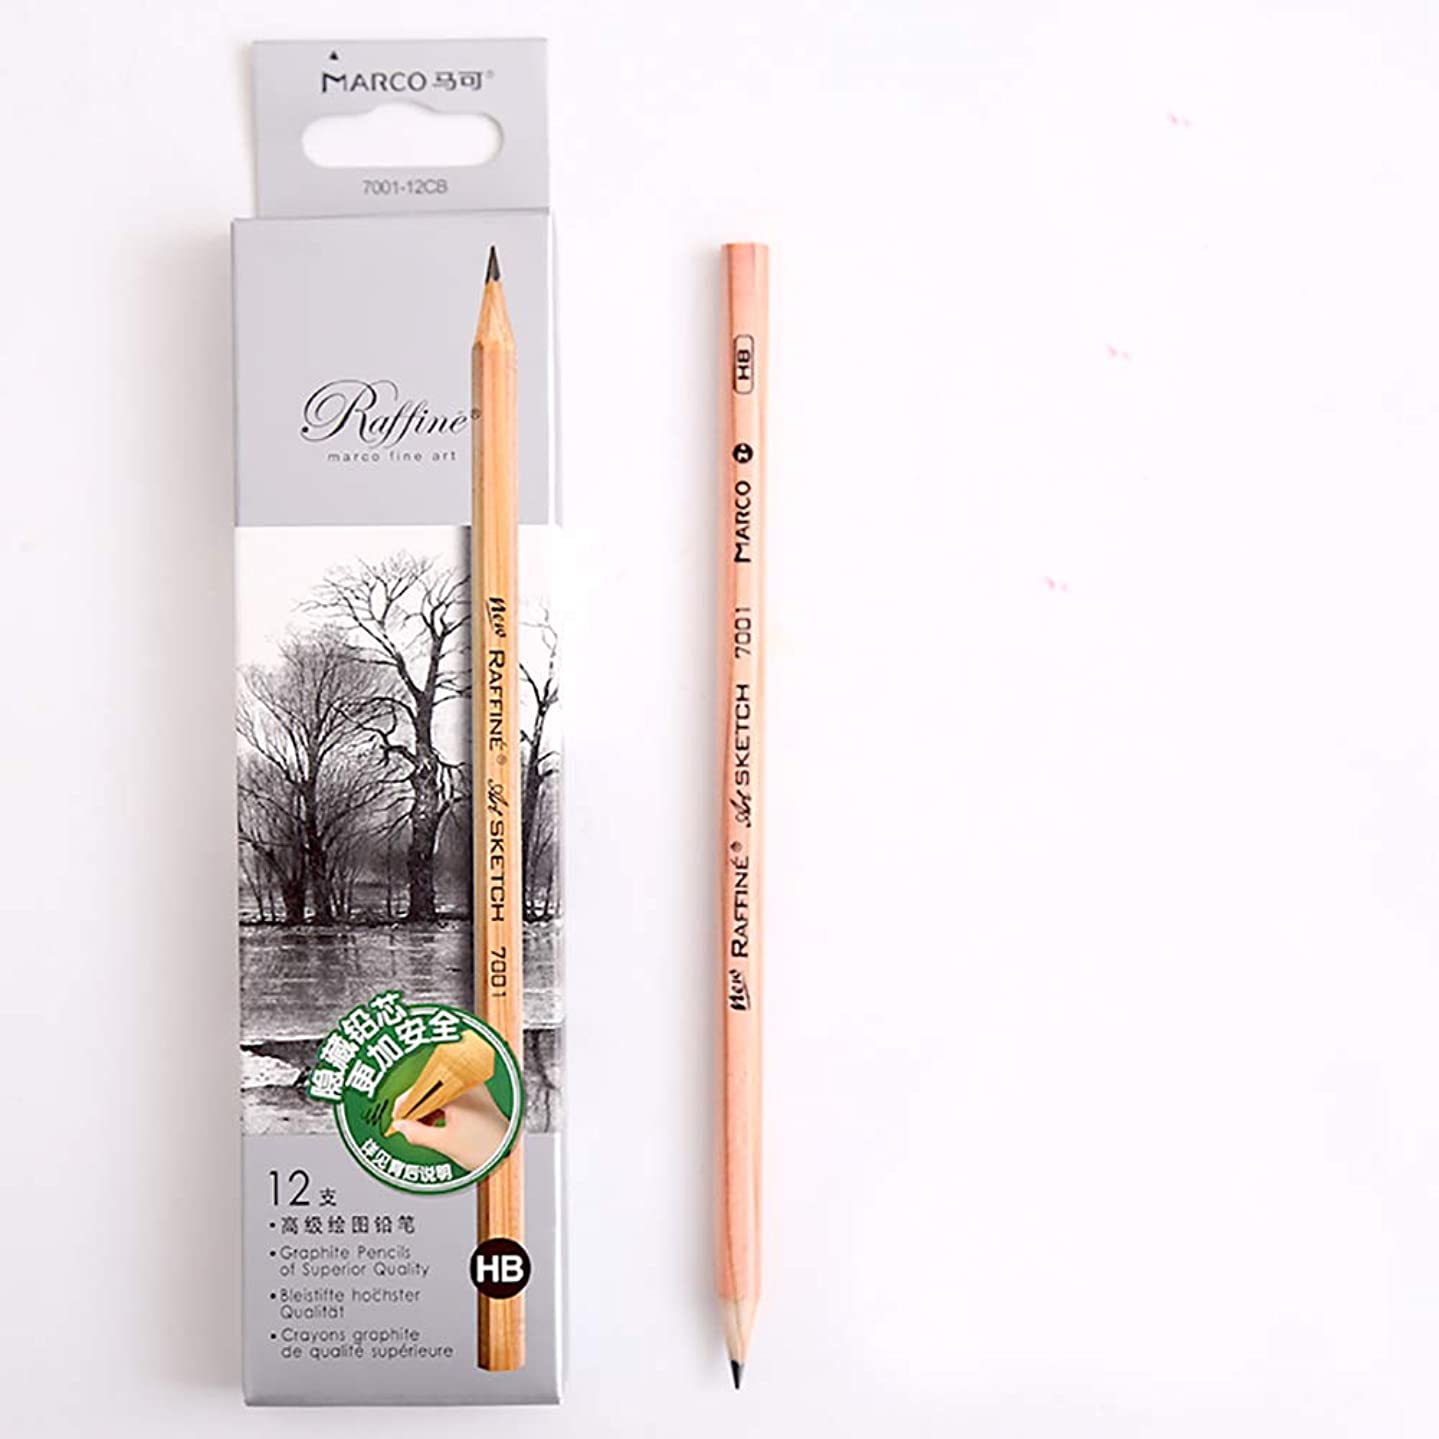 Sketch Pencil Log Pencil Drawing Pencil Art Pencils Sketch Travel Precision Graphite Pencils for Adults 12 Piece (HB)